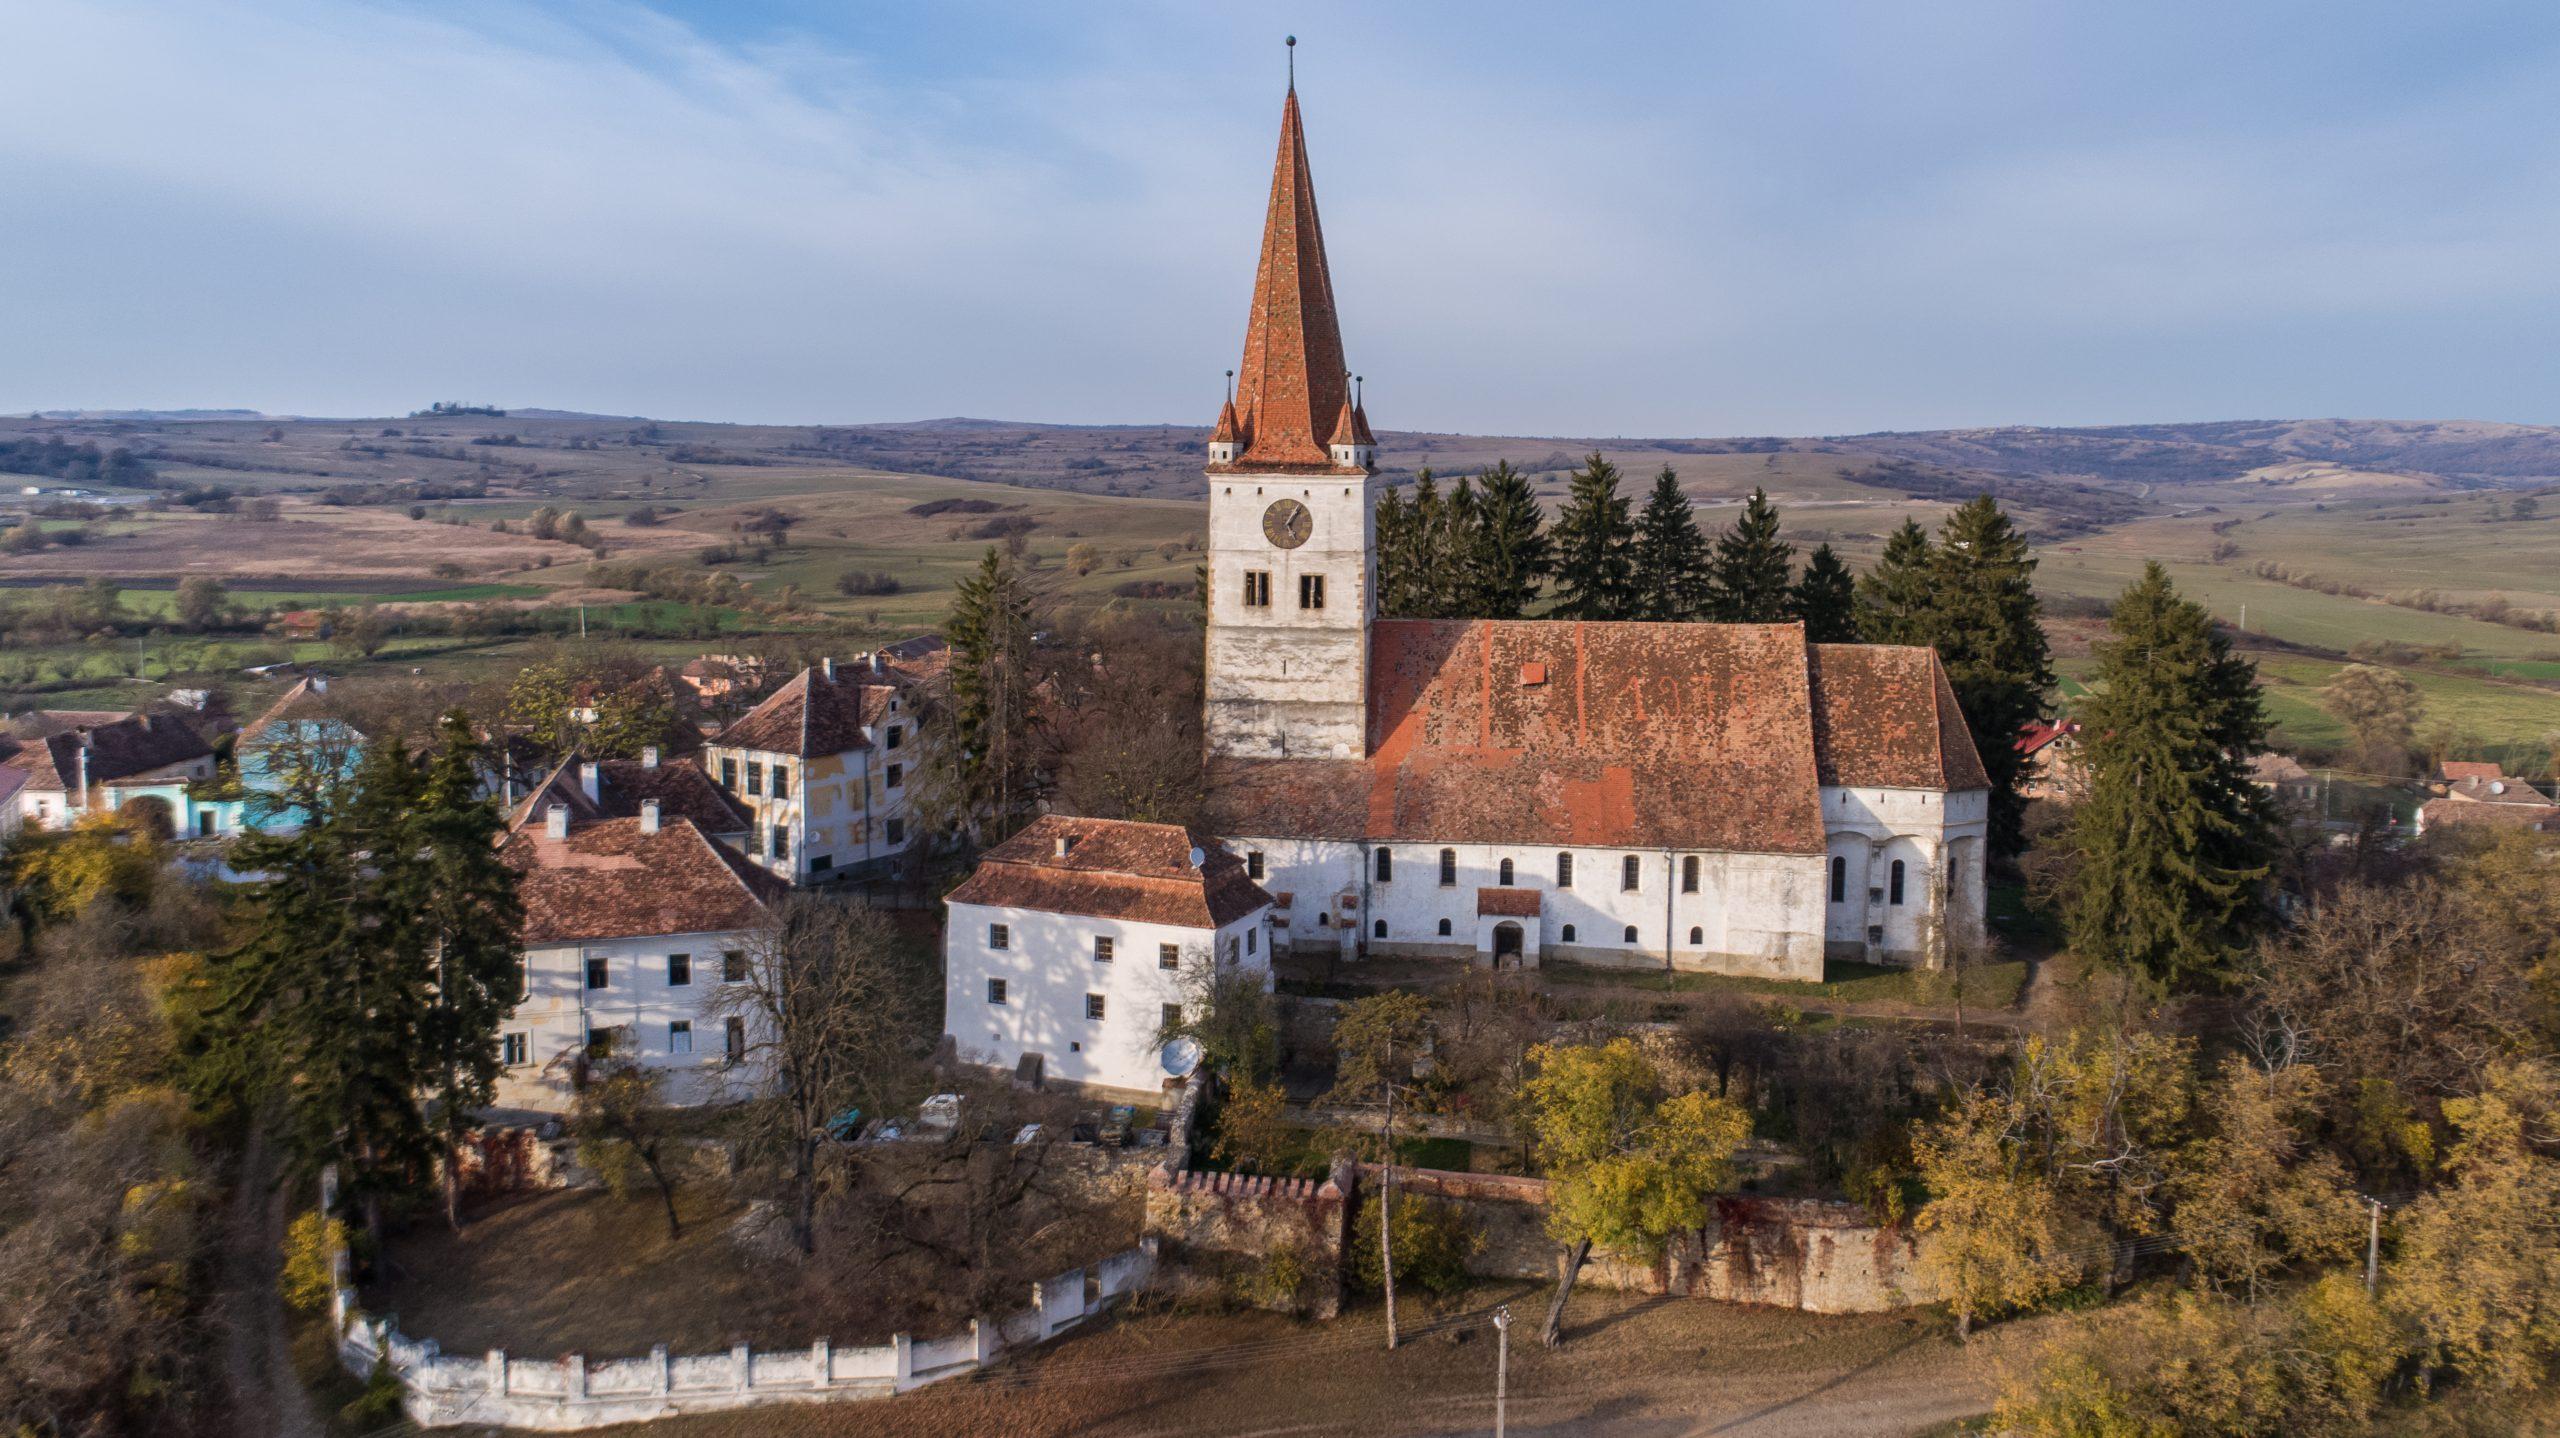 cincu medieval church P2CJRHC 3 scaled